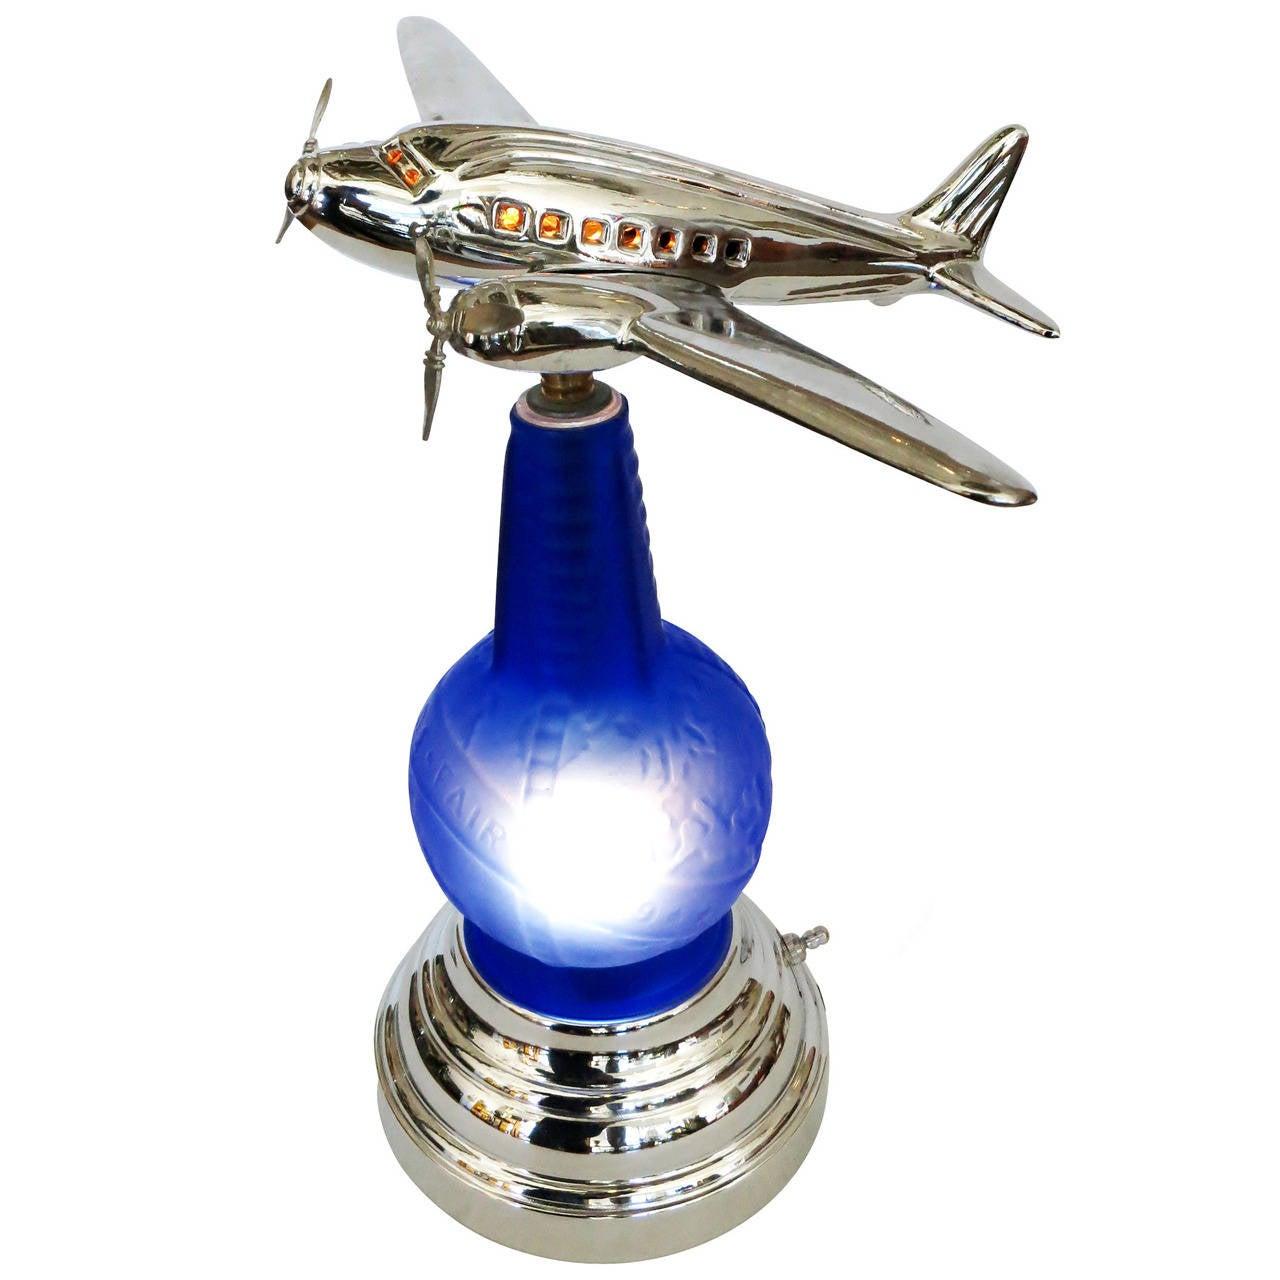 1939 Worlds Fair Light Up Bottle Airplane Lamp 1 - 1939 Worlds Fair Light Up Bottle Airplane Lamp For Sale At 1stdibs